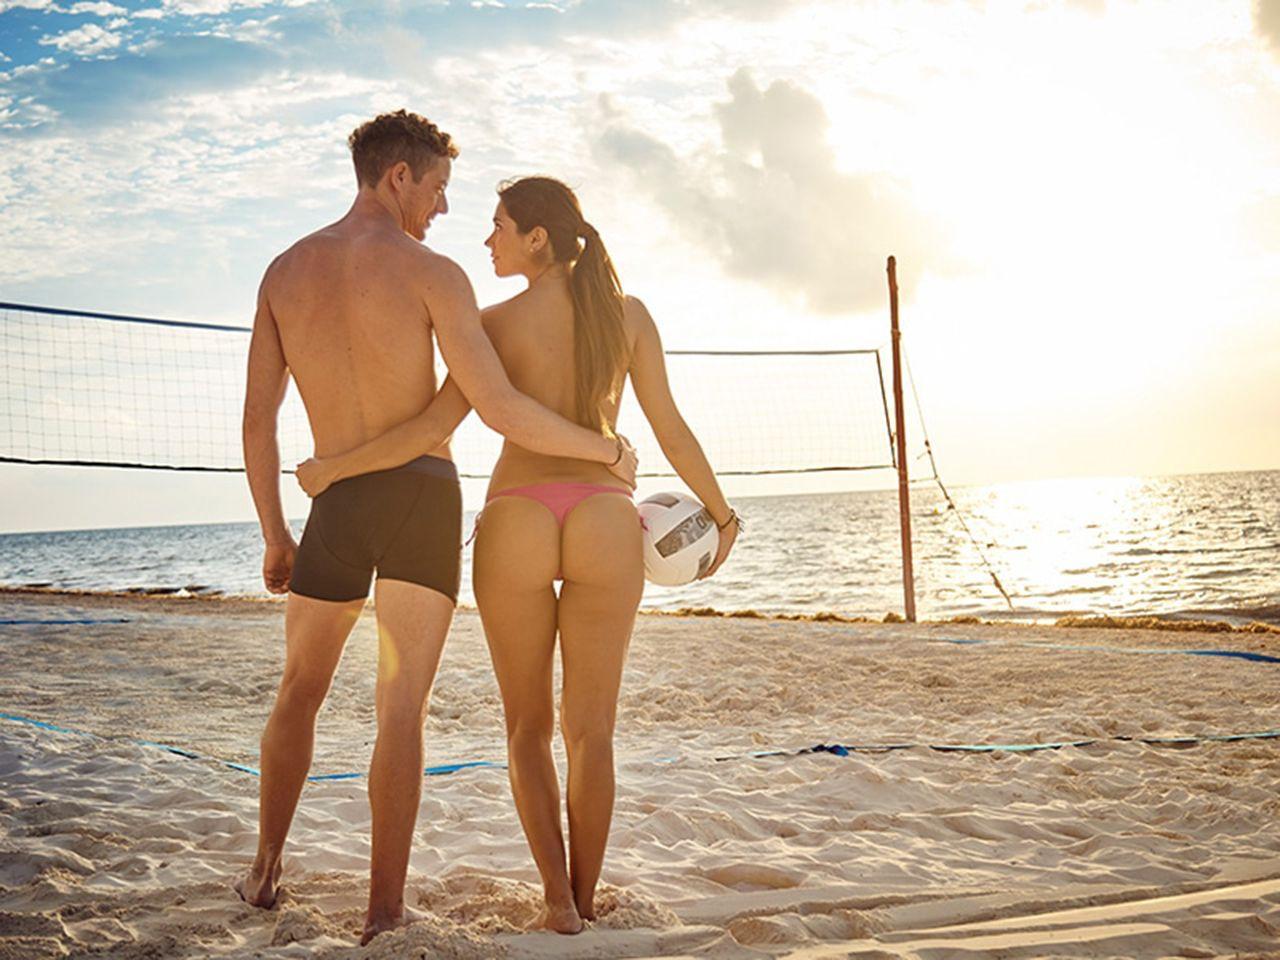 Snappie reccomend Nude at desire resort